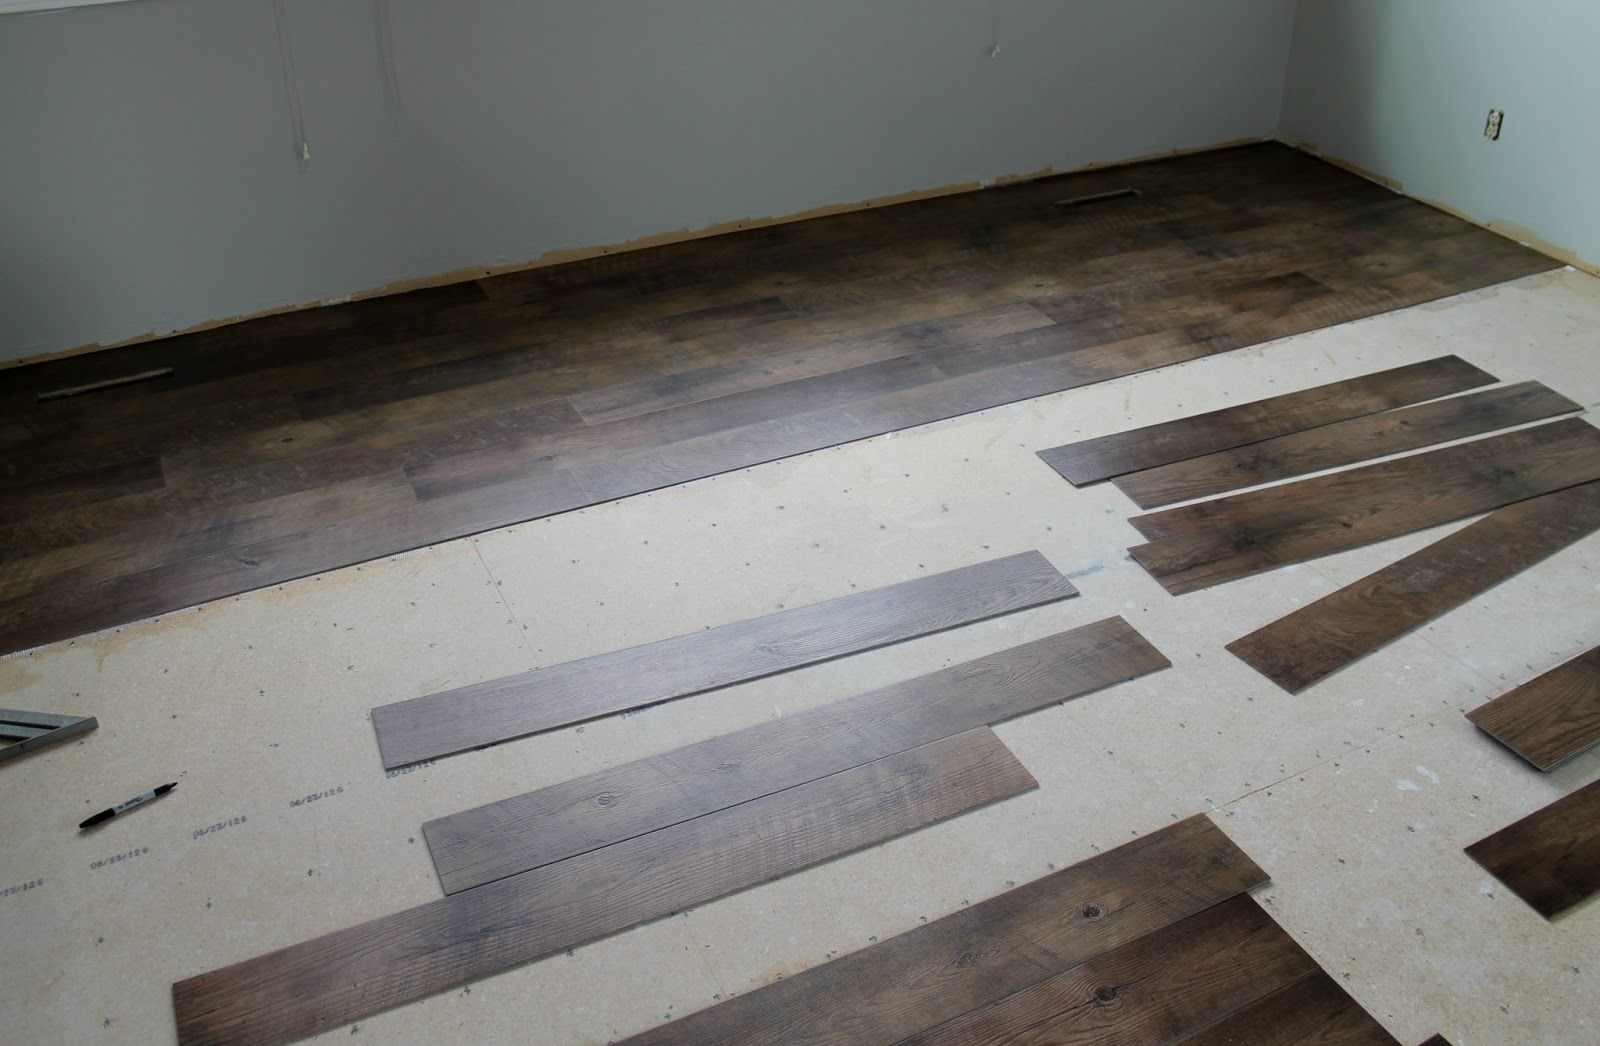 self adhesive vinyl garage floor tiles